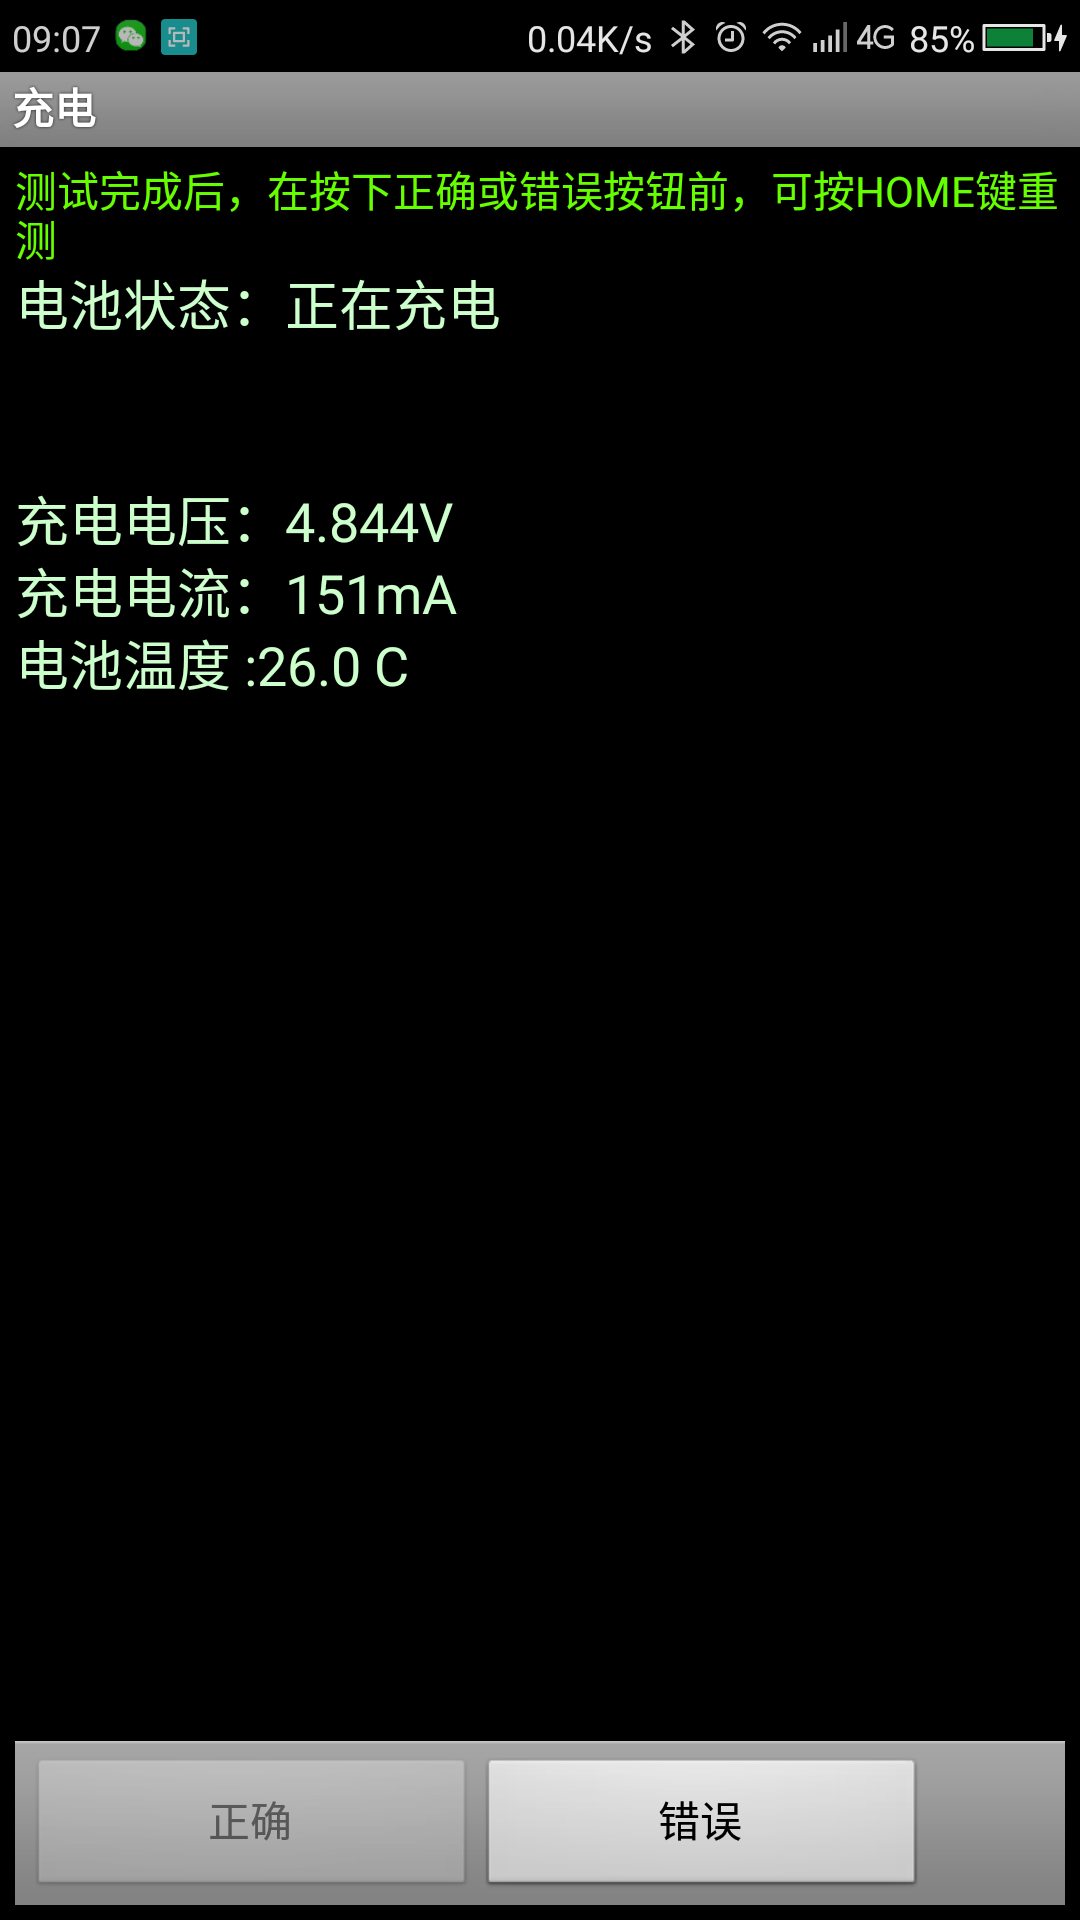 Screenshot_2017-01-25-09-07-15.png